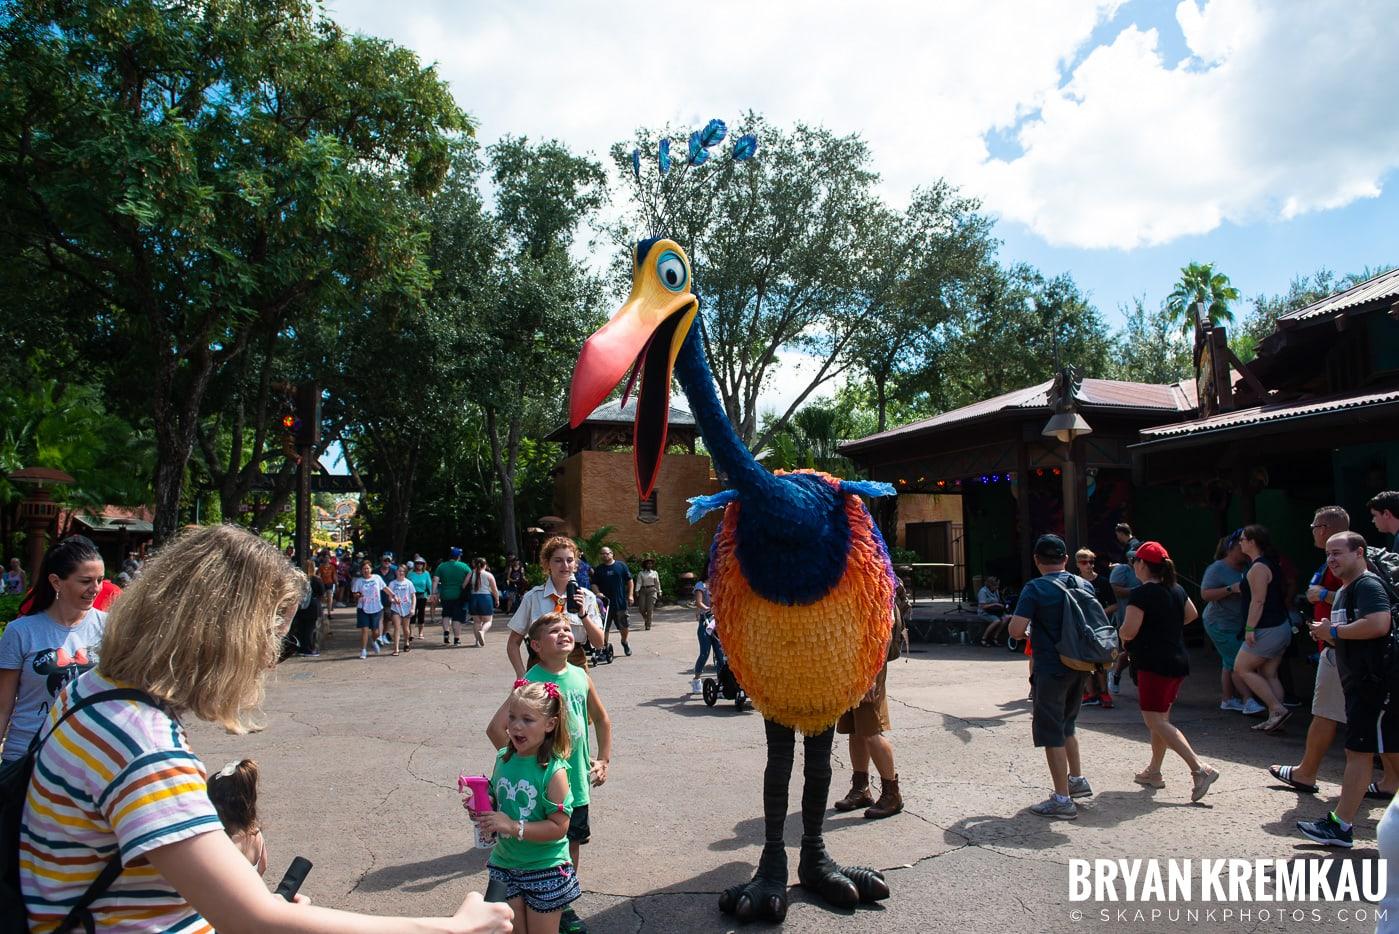 Walt Disney World Vacation: Day 5 (Animal Kingdom / Disney's Hollywood Studios) - 10.3.19 (51)